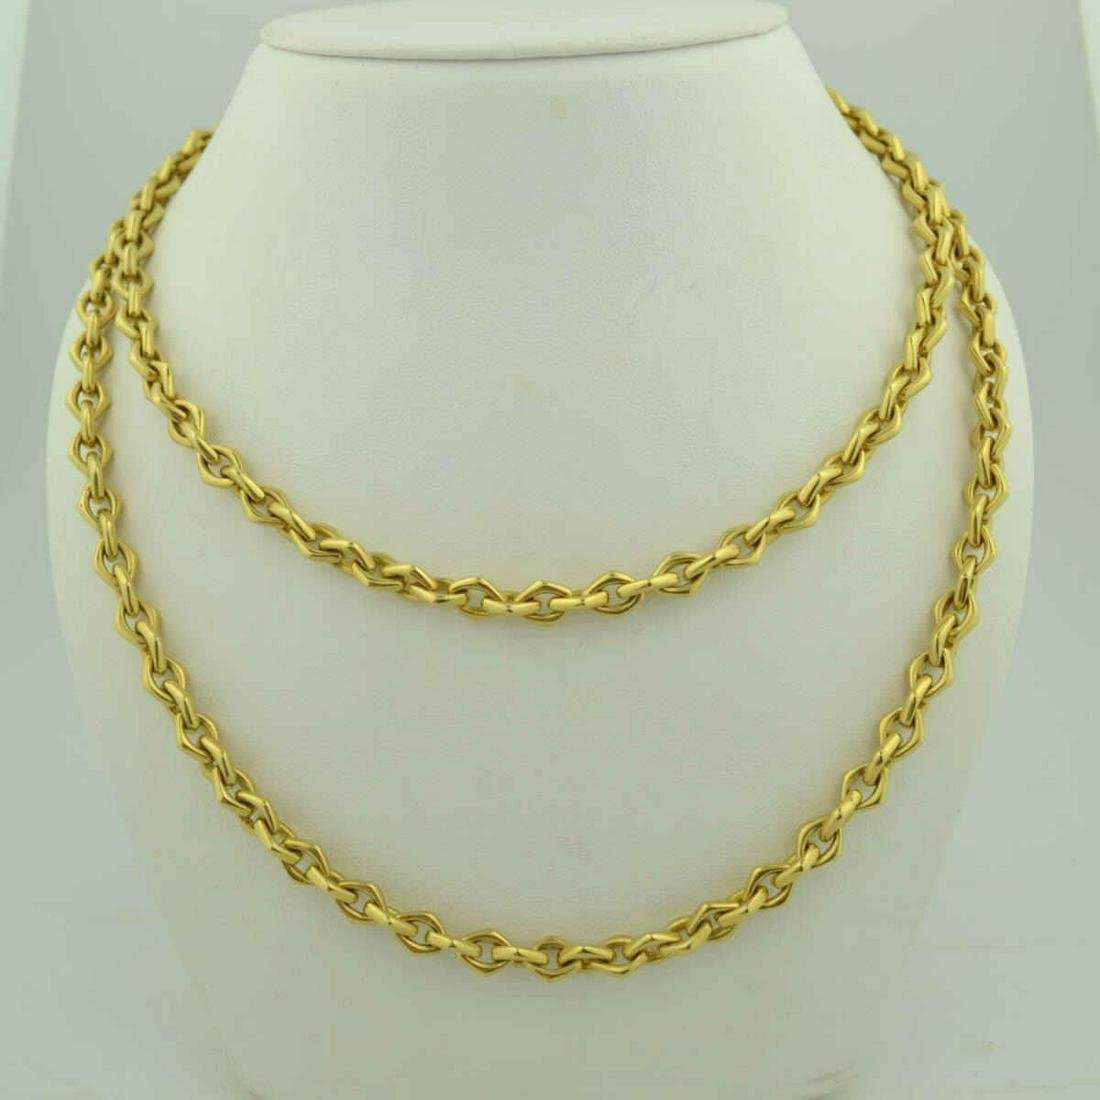 18kt yellow gold Tiffany fancy link chain